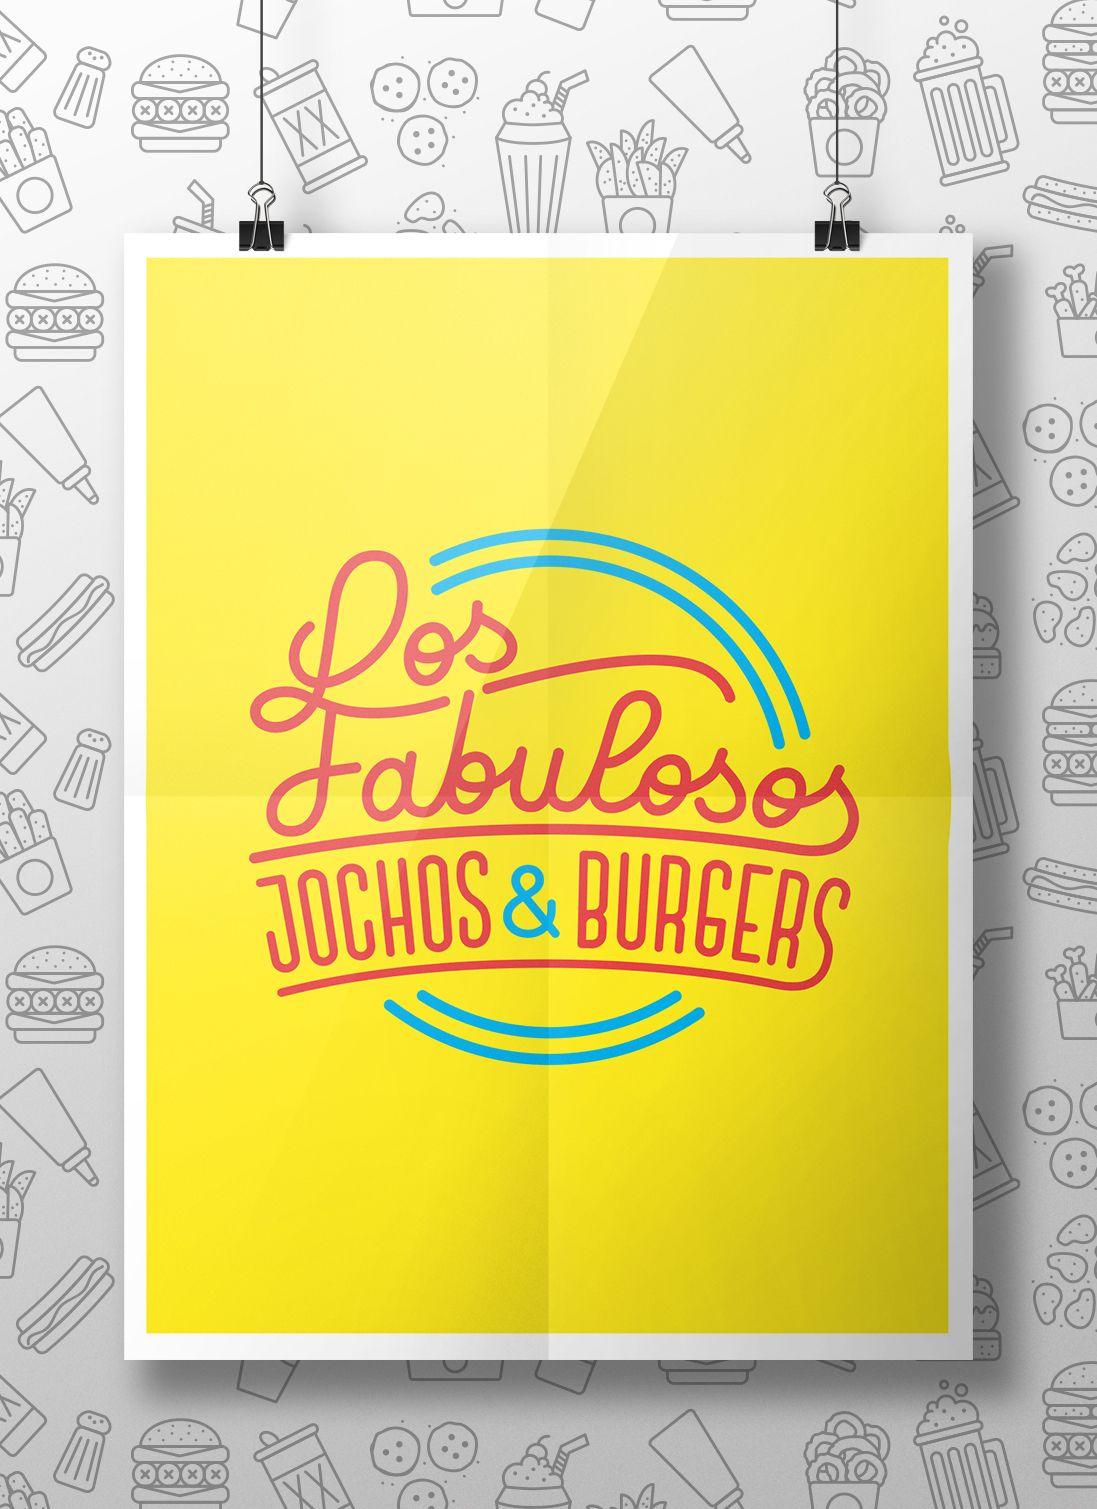 Los Fabulosos, Jochos & Burgers / Branding & Lettering on Behance